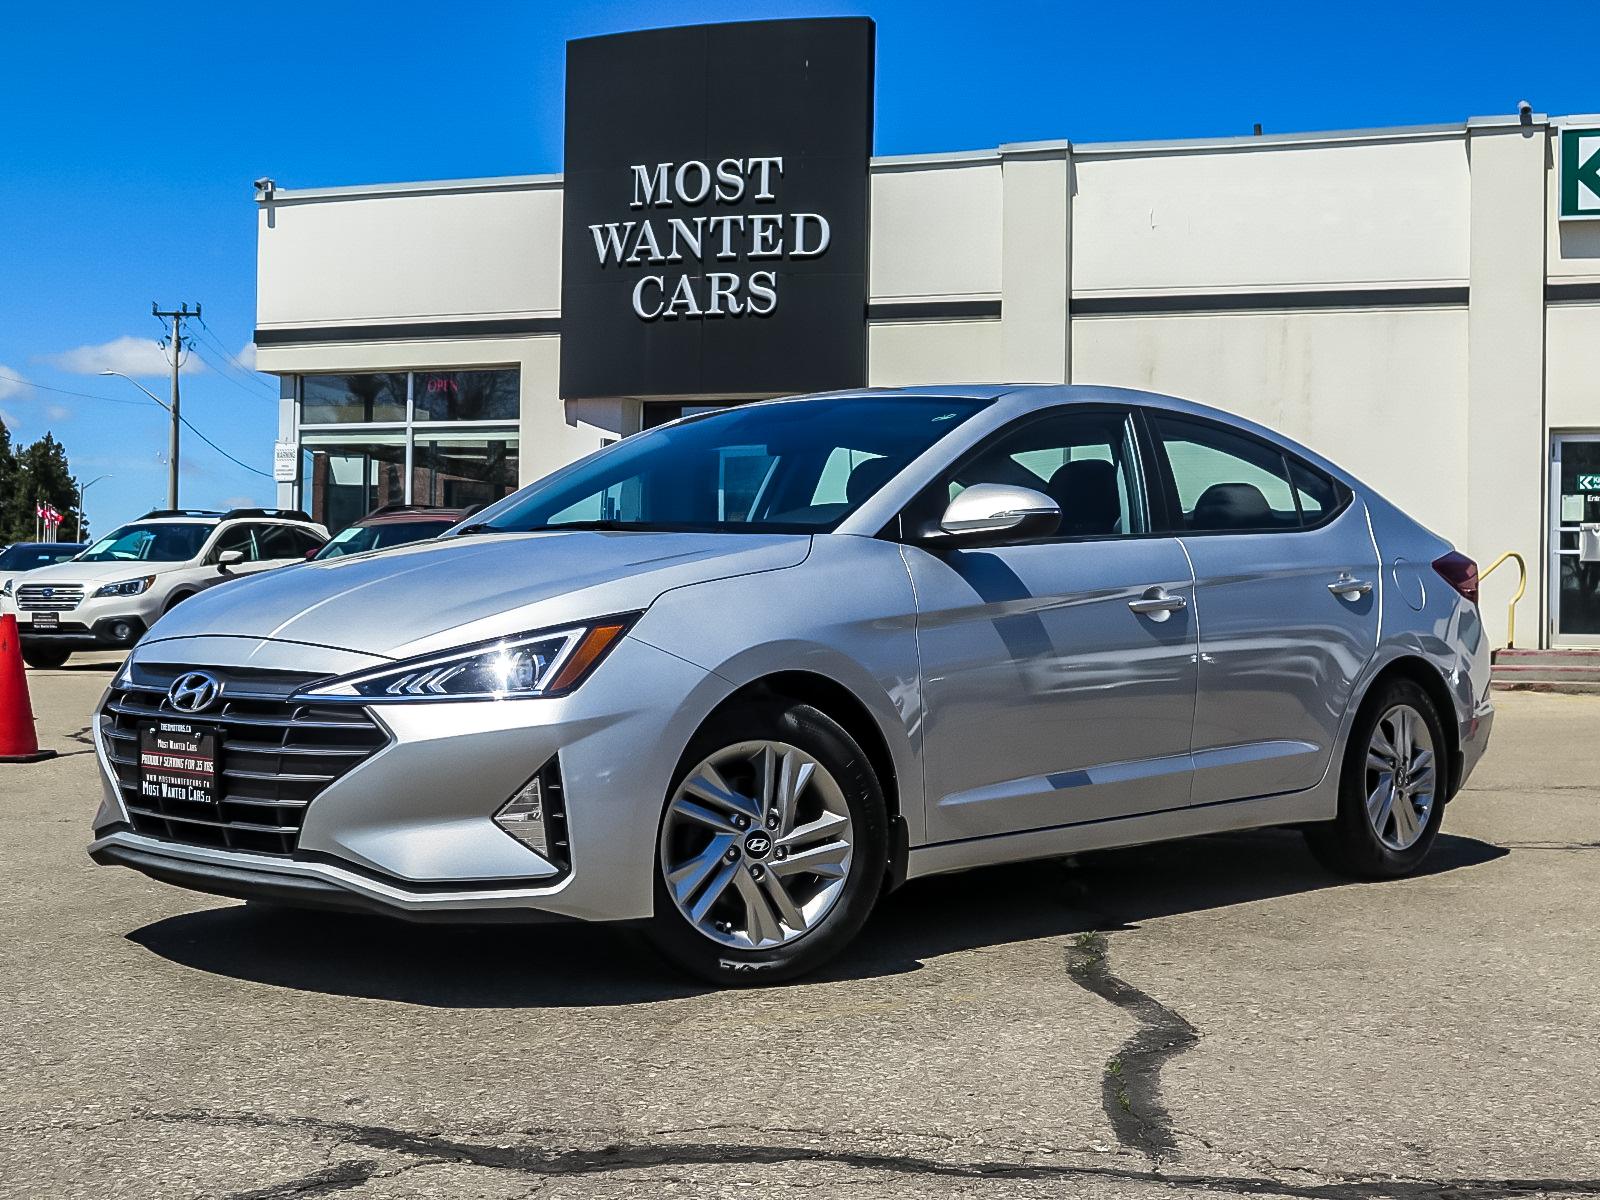 used 2019 Hyundai Elantra car, priced at $19,293